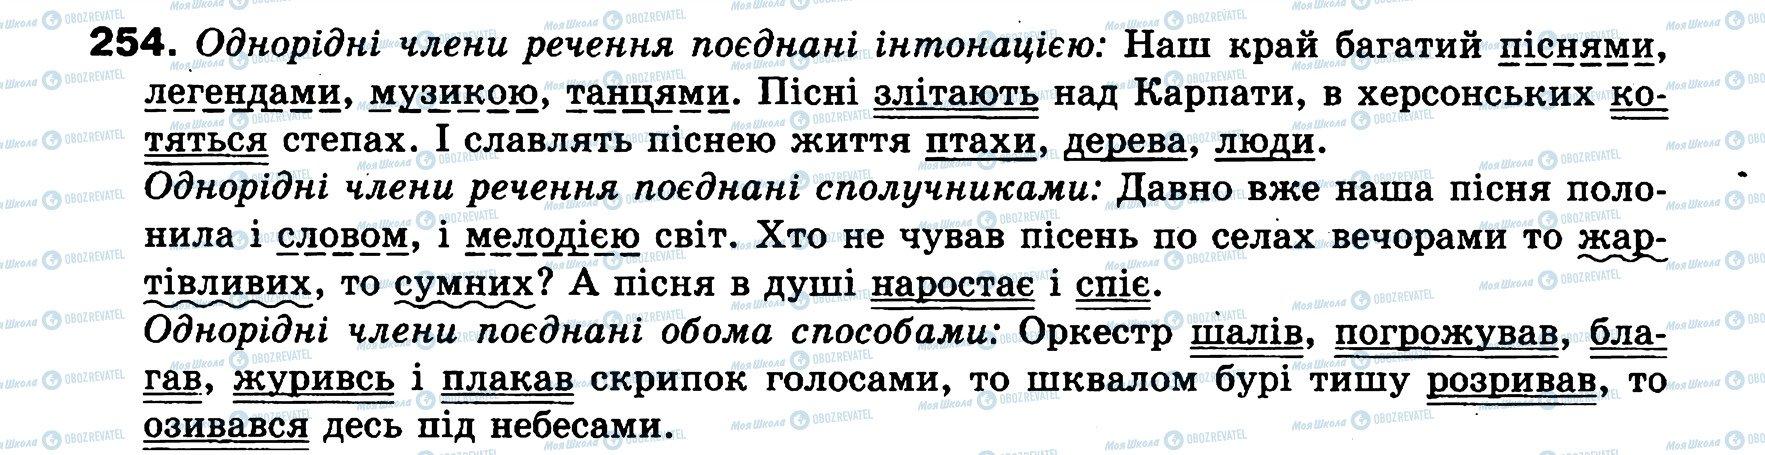 ГДЗ Укр мова 8 класс страница 254